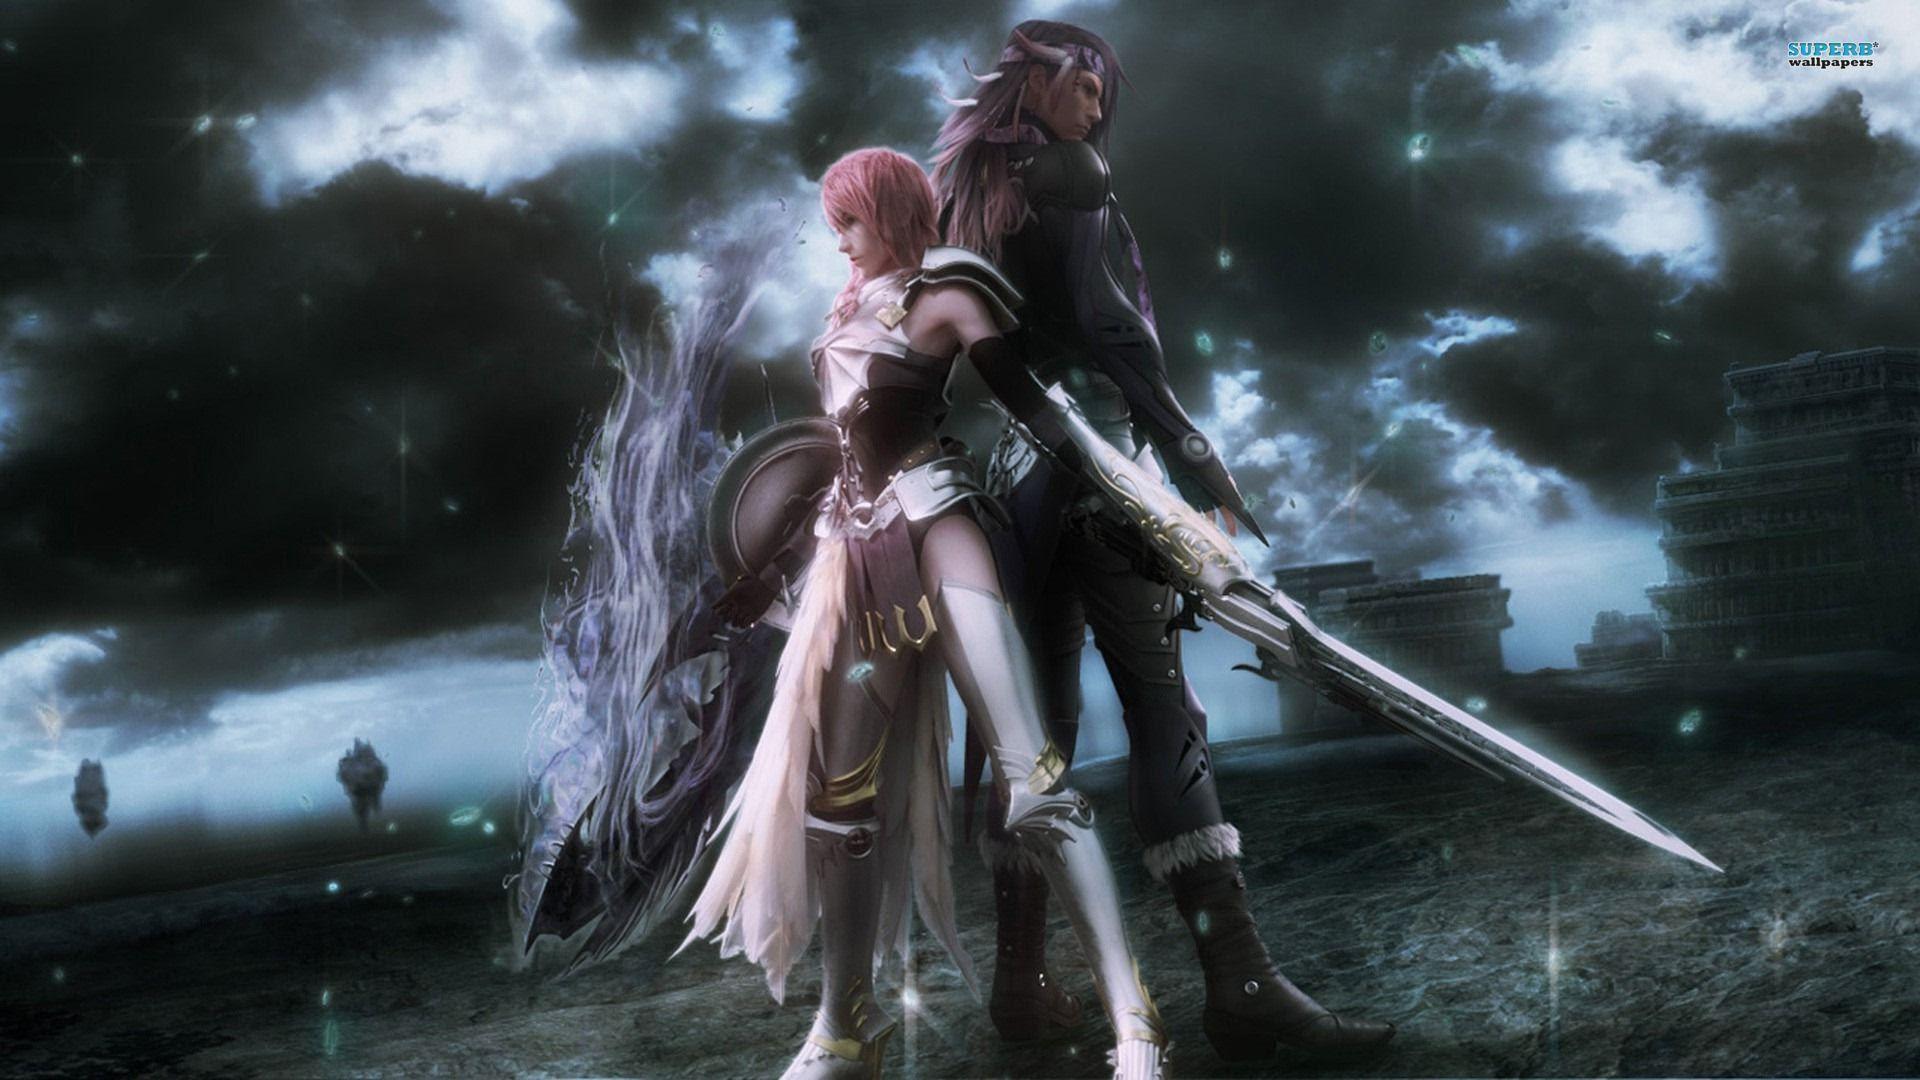 Final Fantasy Hd Wallpaper 1080p 81 Images